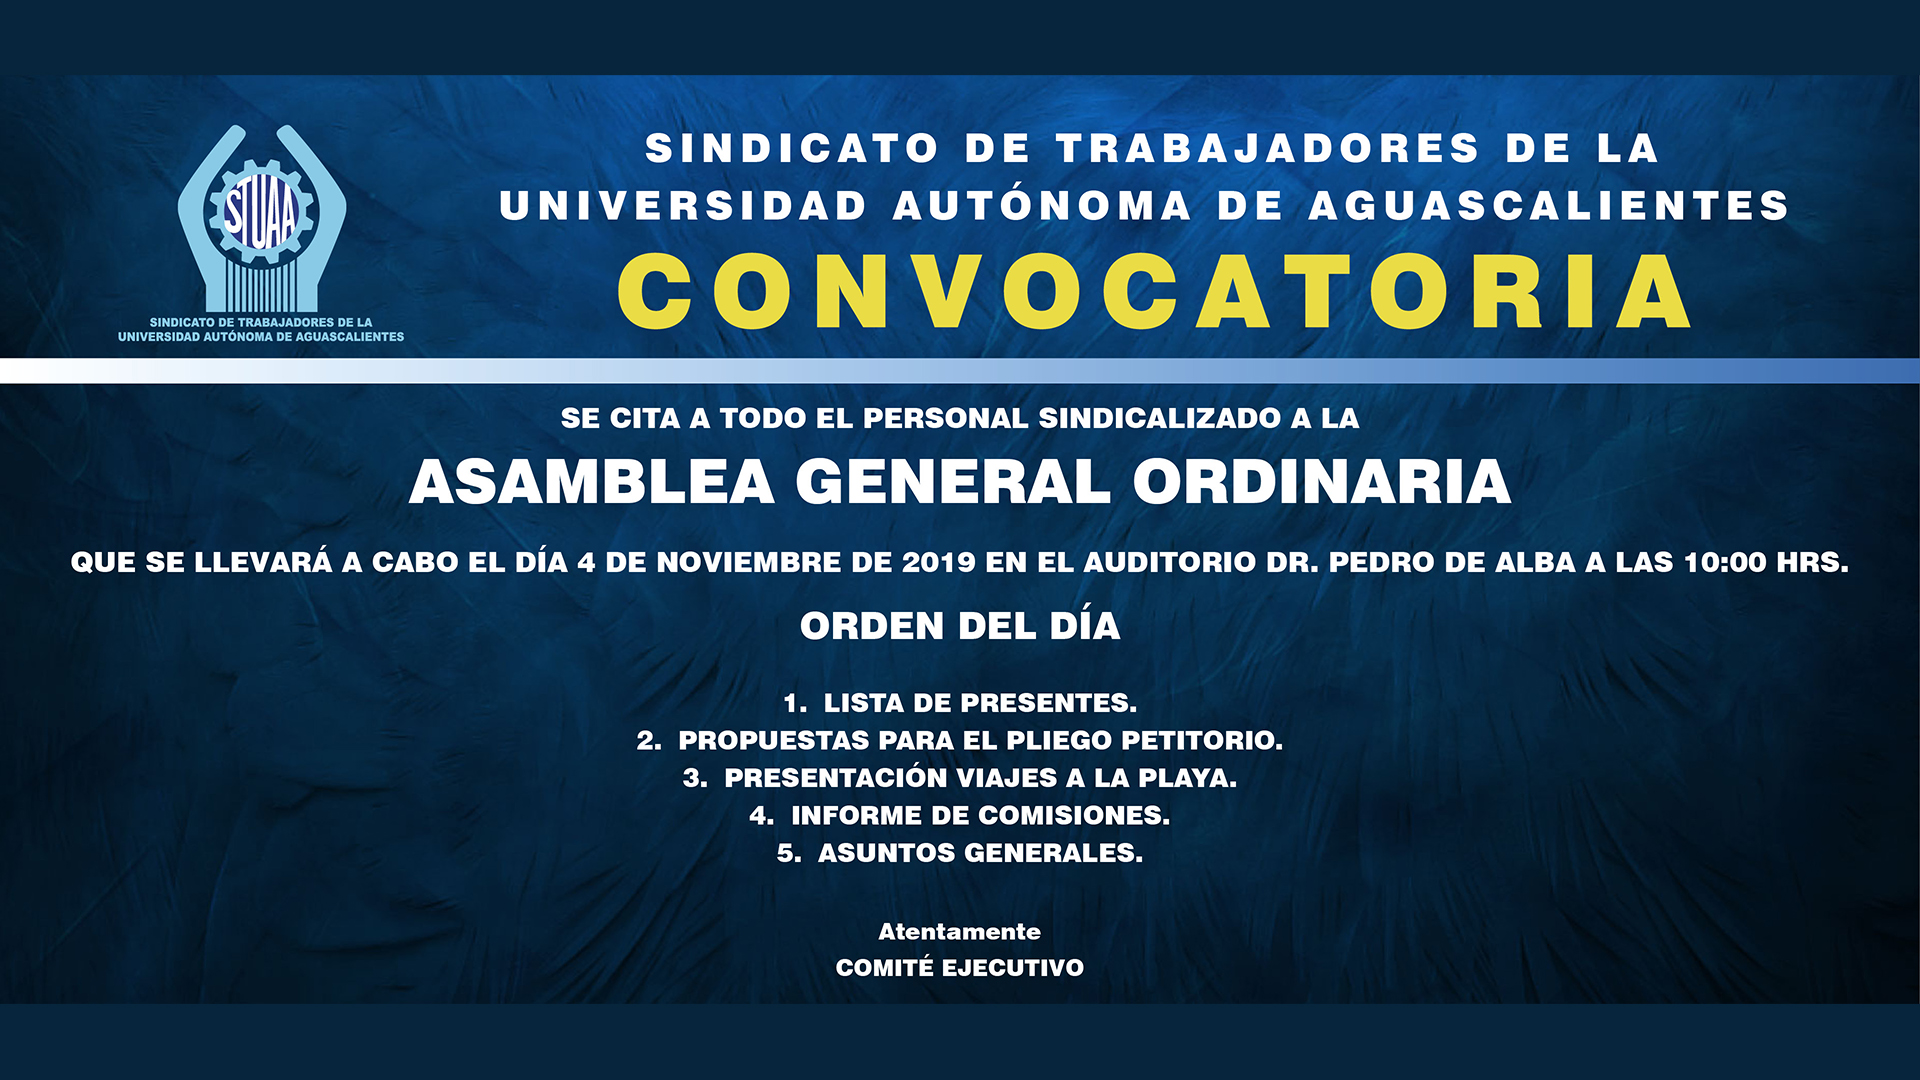 Asamblea general ordinaria STUAA